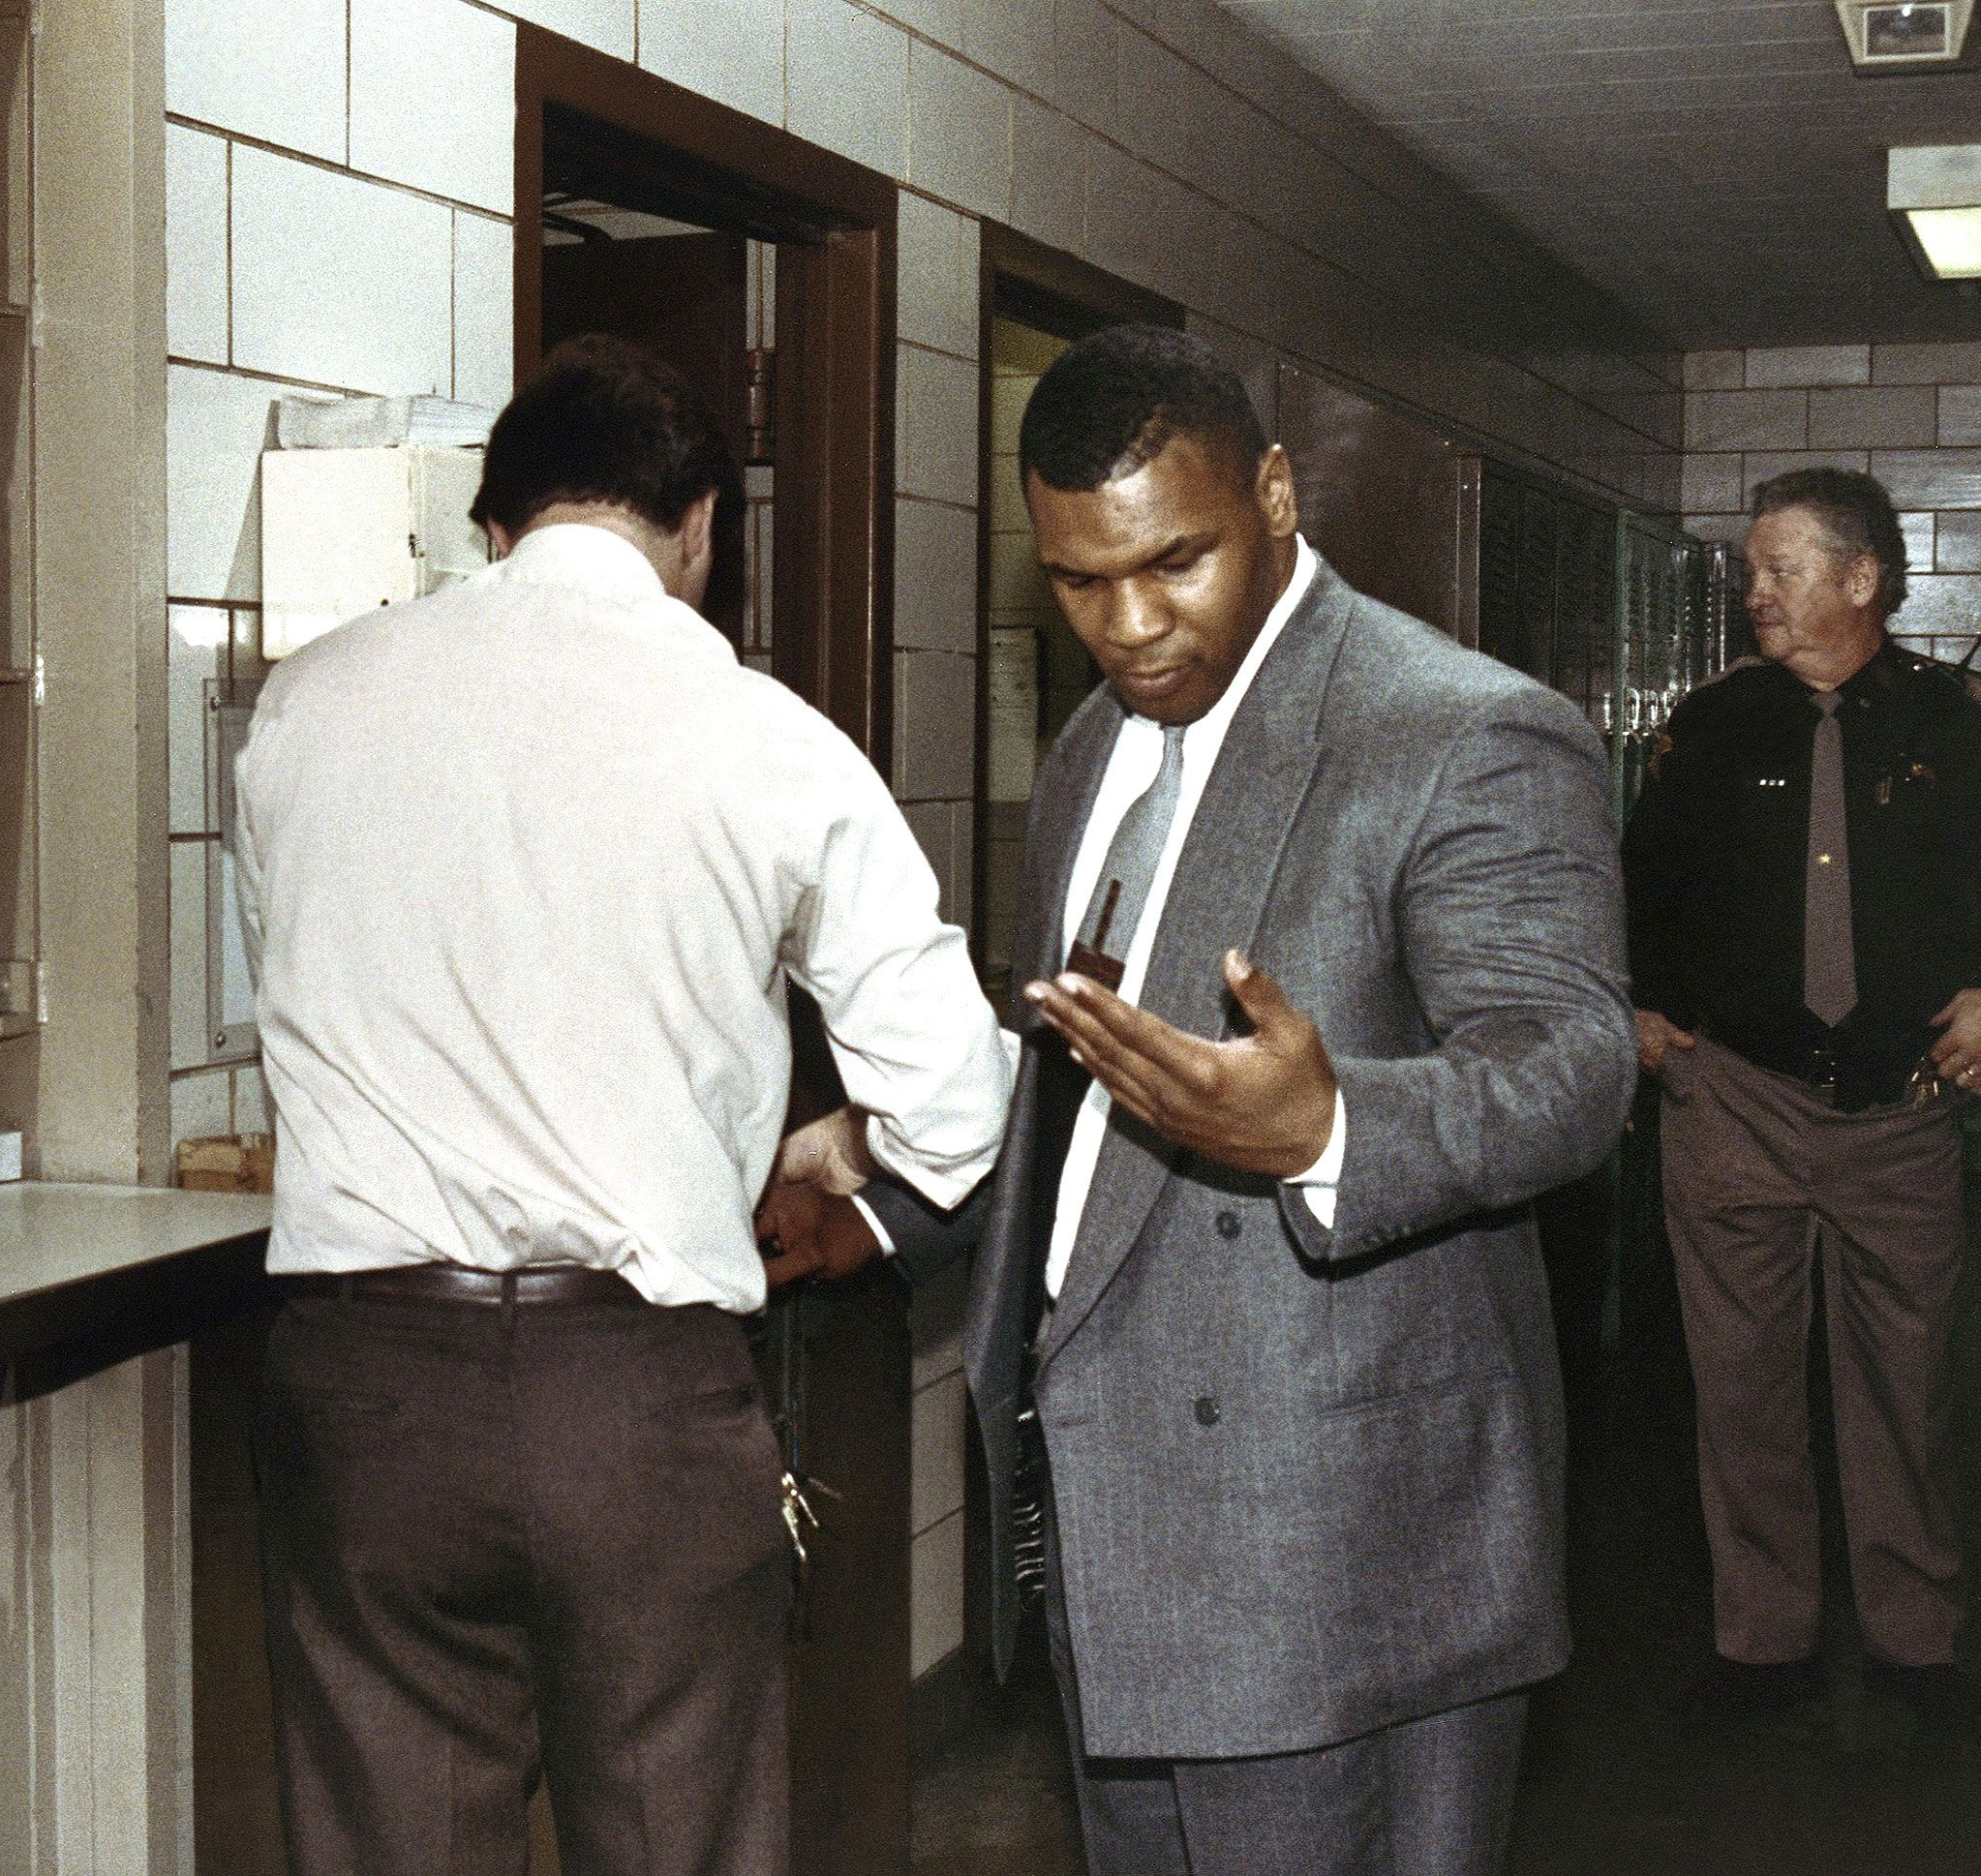 Tyson sentenced